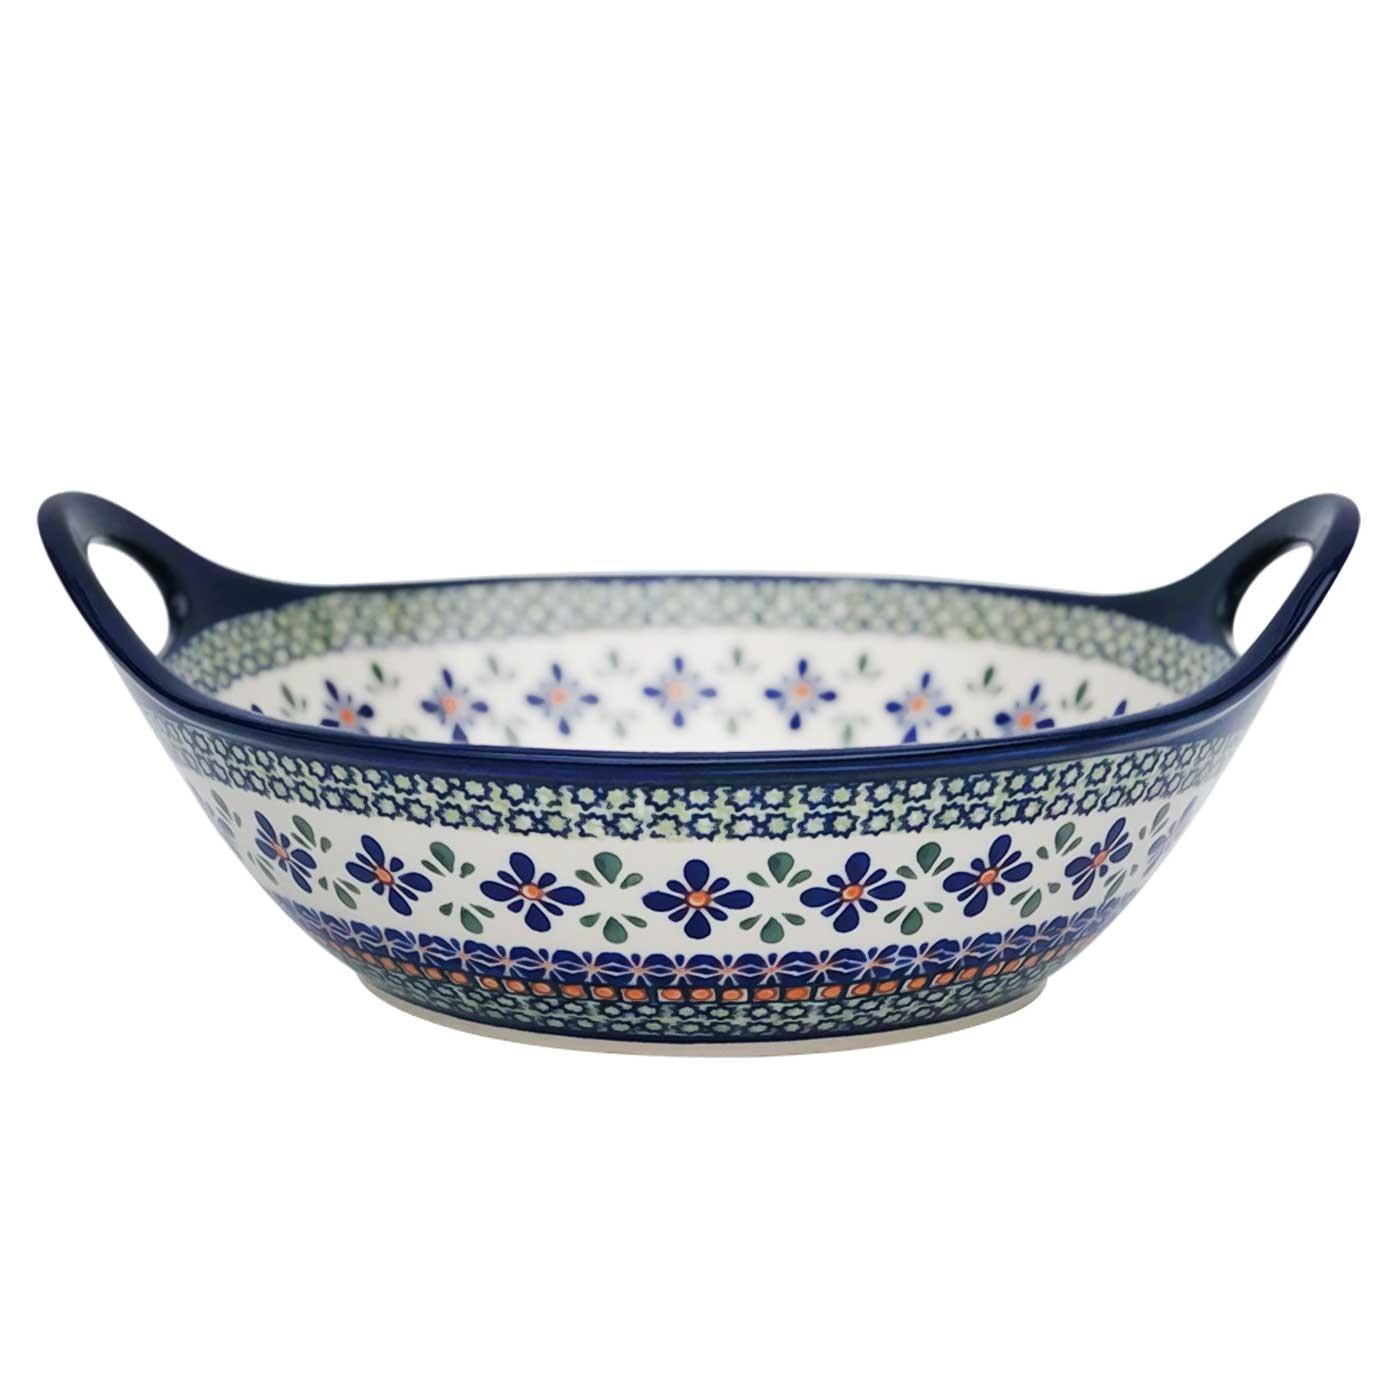 "Pottery Avenue Sweetie Pie 11.5"" Handled Stoneware Bowl-Baler (MD) - 1814-DU60 Sweetie Pie"